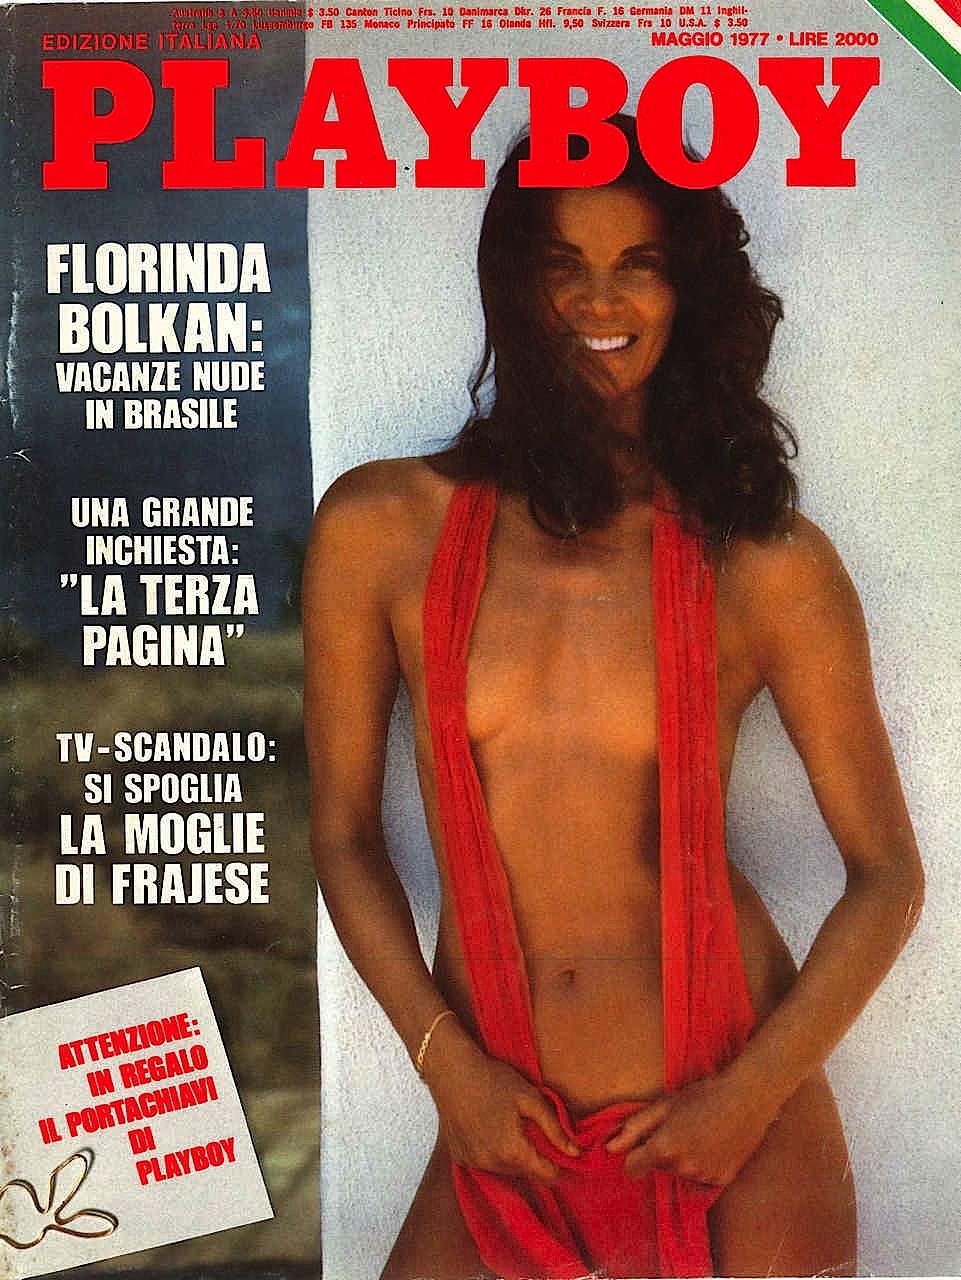 Florinda_Bolkan_playboy_1977